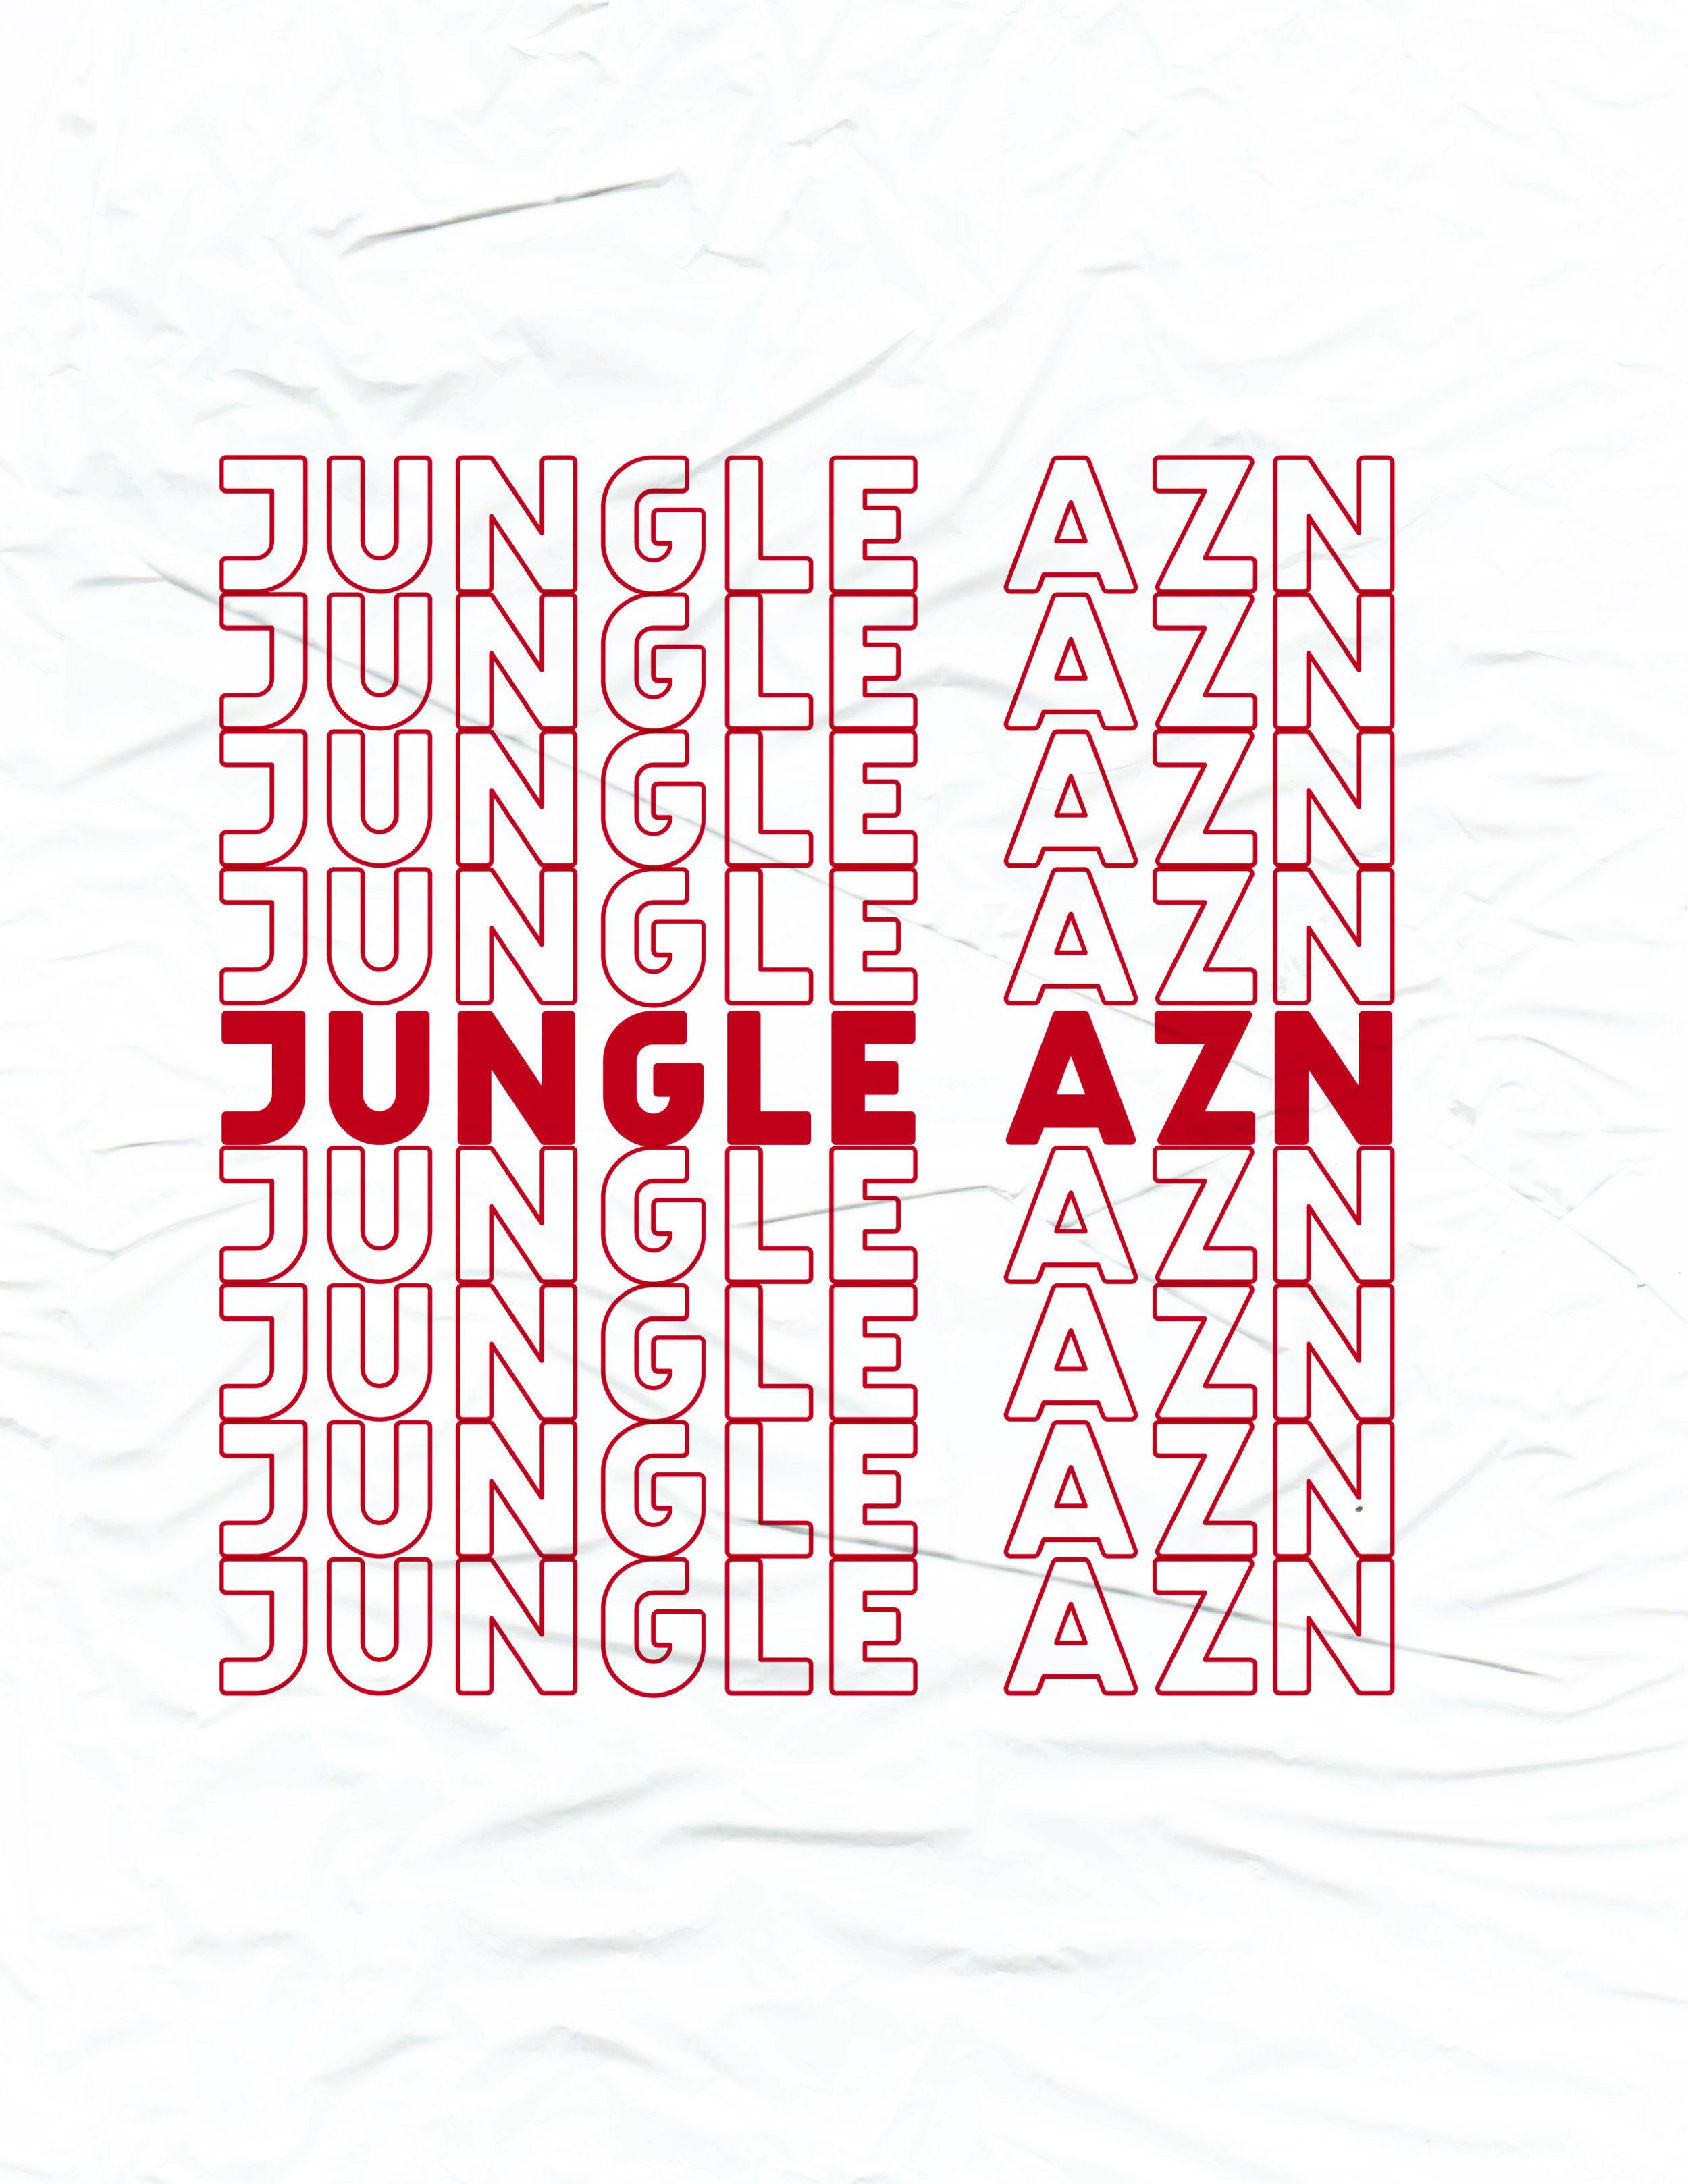 jungle azn - back cover.jpg